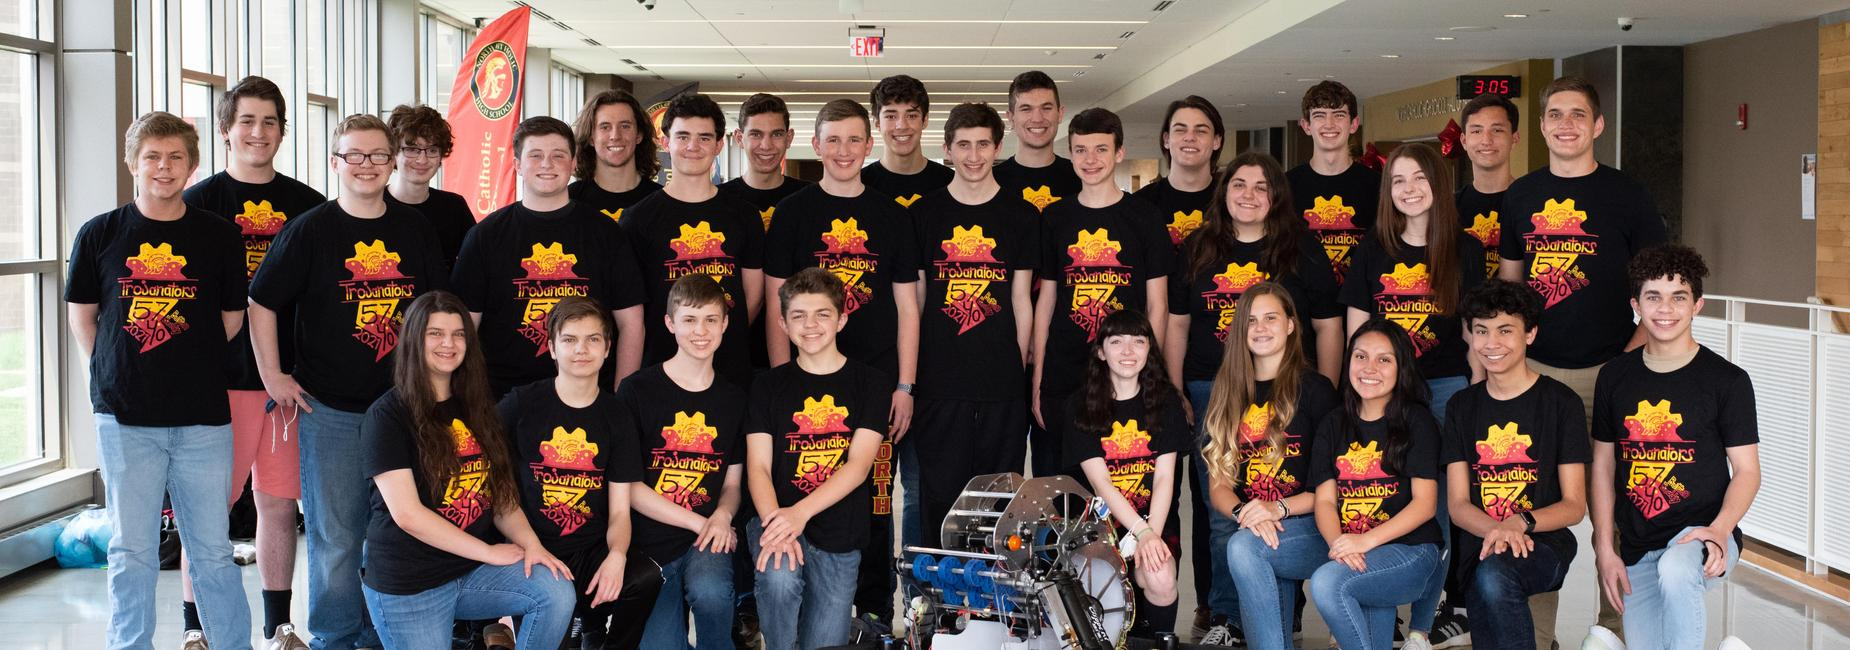 Robotics North Catholic High School